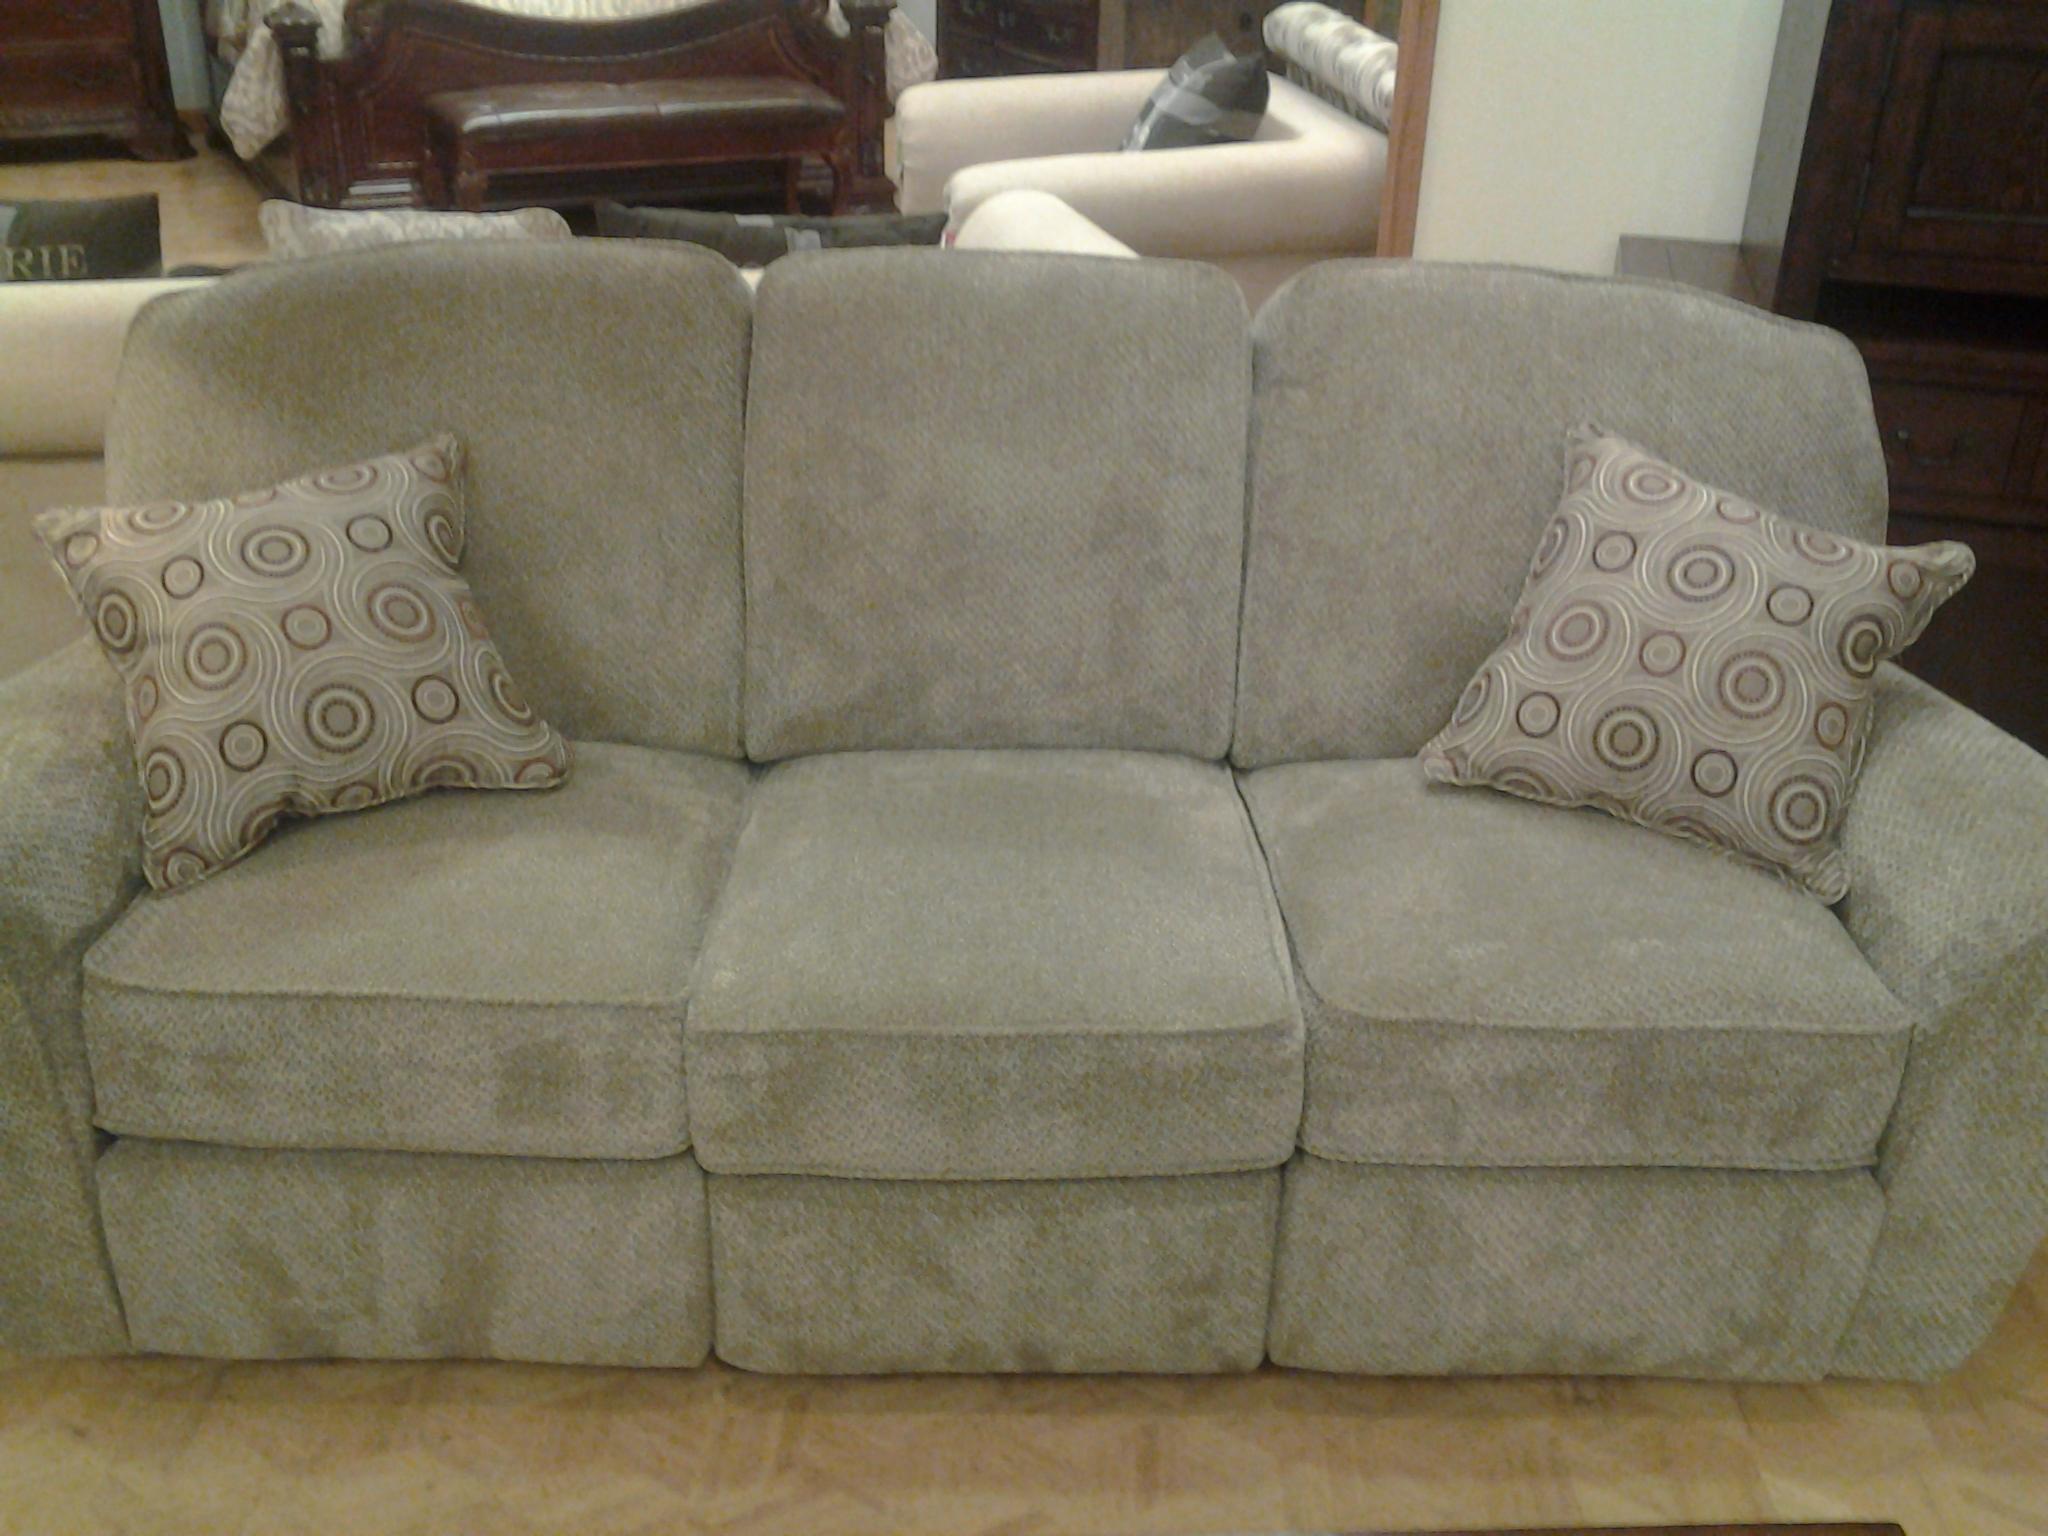 cindy crawford sleeper sofa nailhead trim elegant slipcovers dillards - sofas